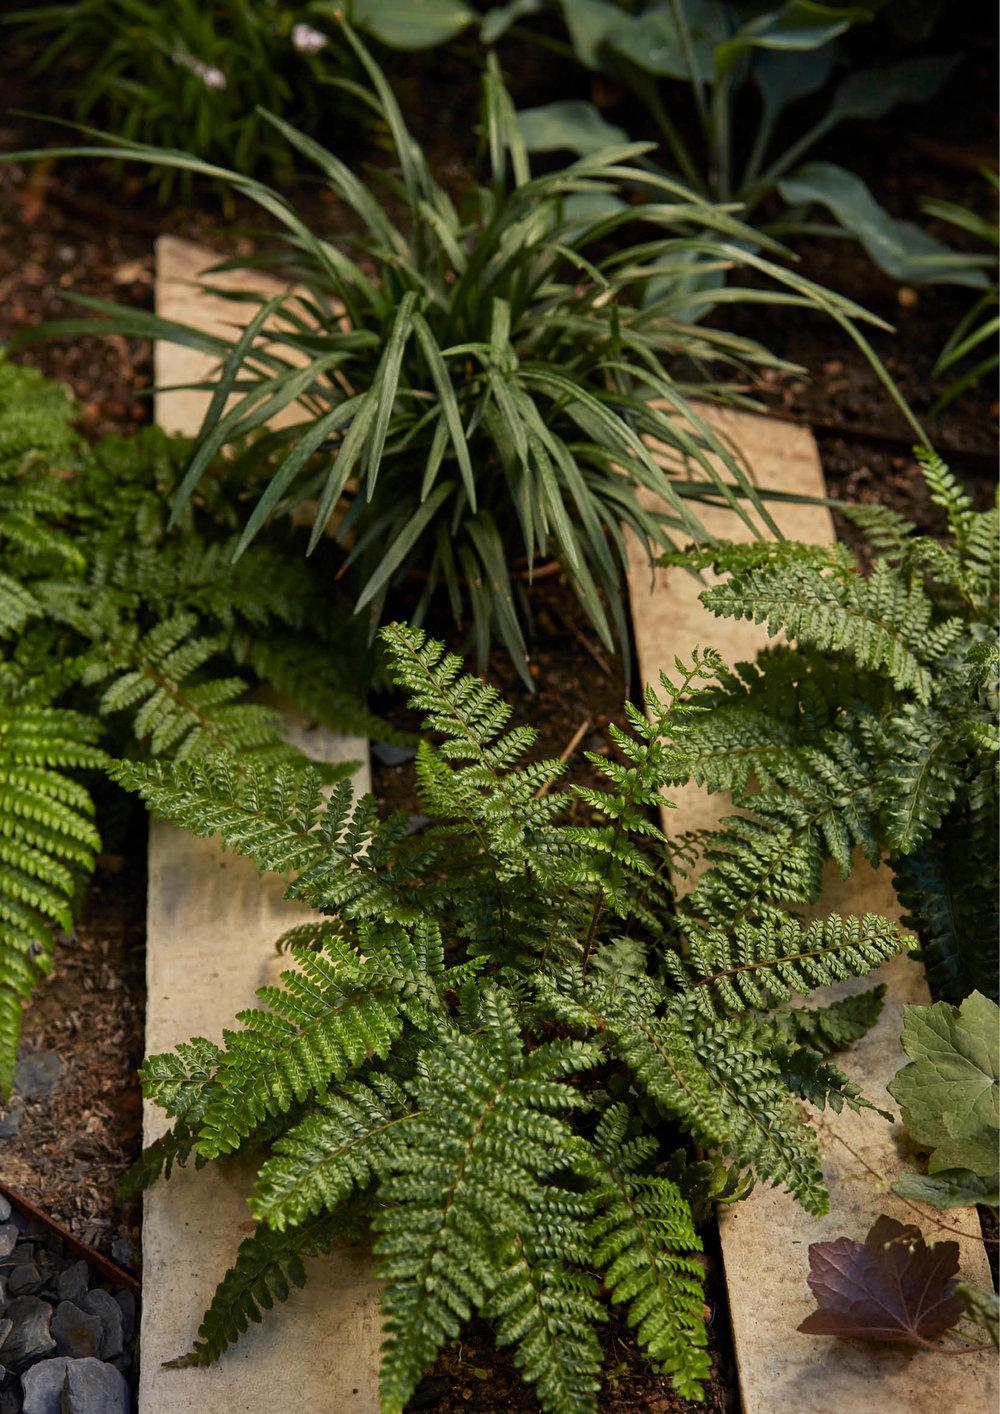 Polystichum polyblepharum & Liriope muscari